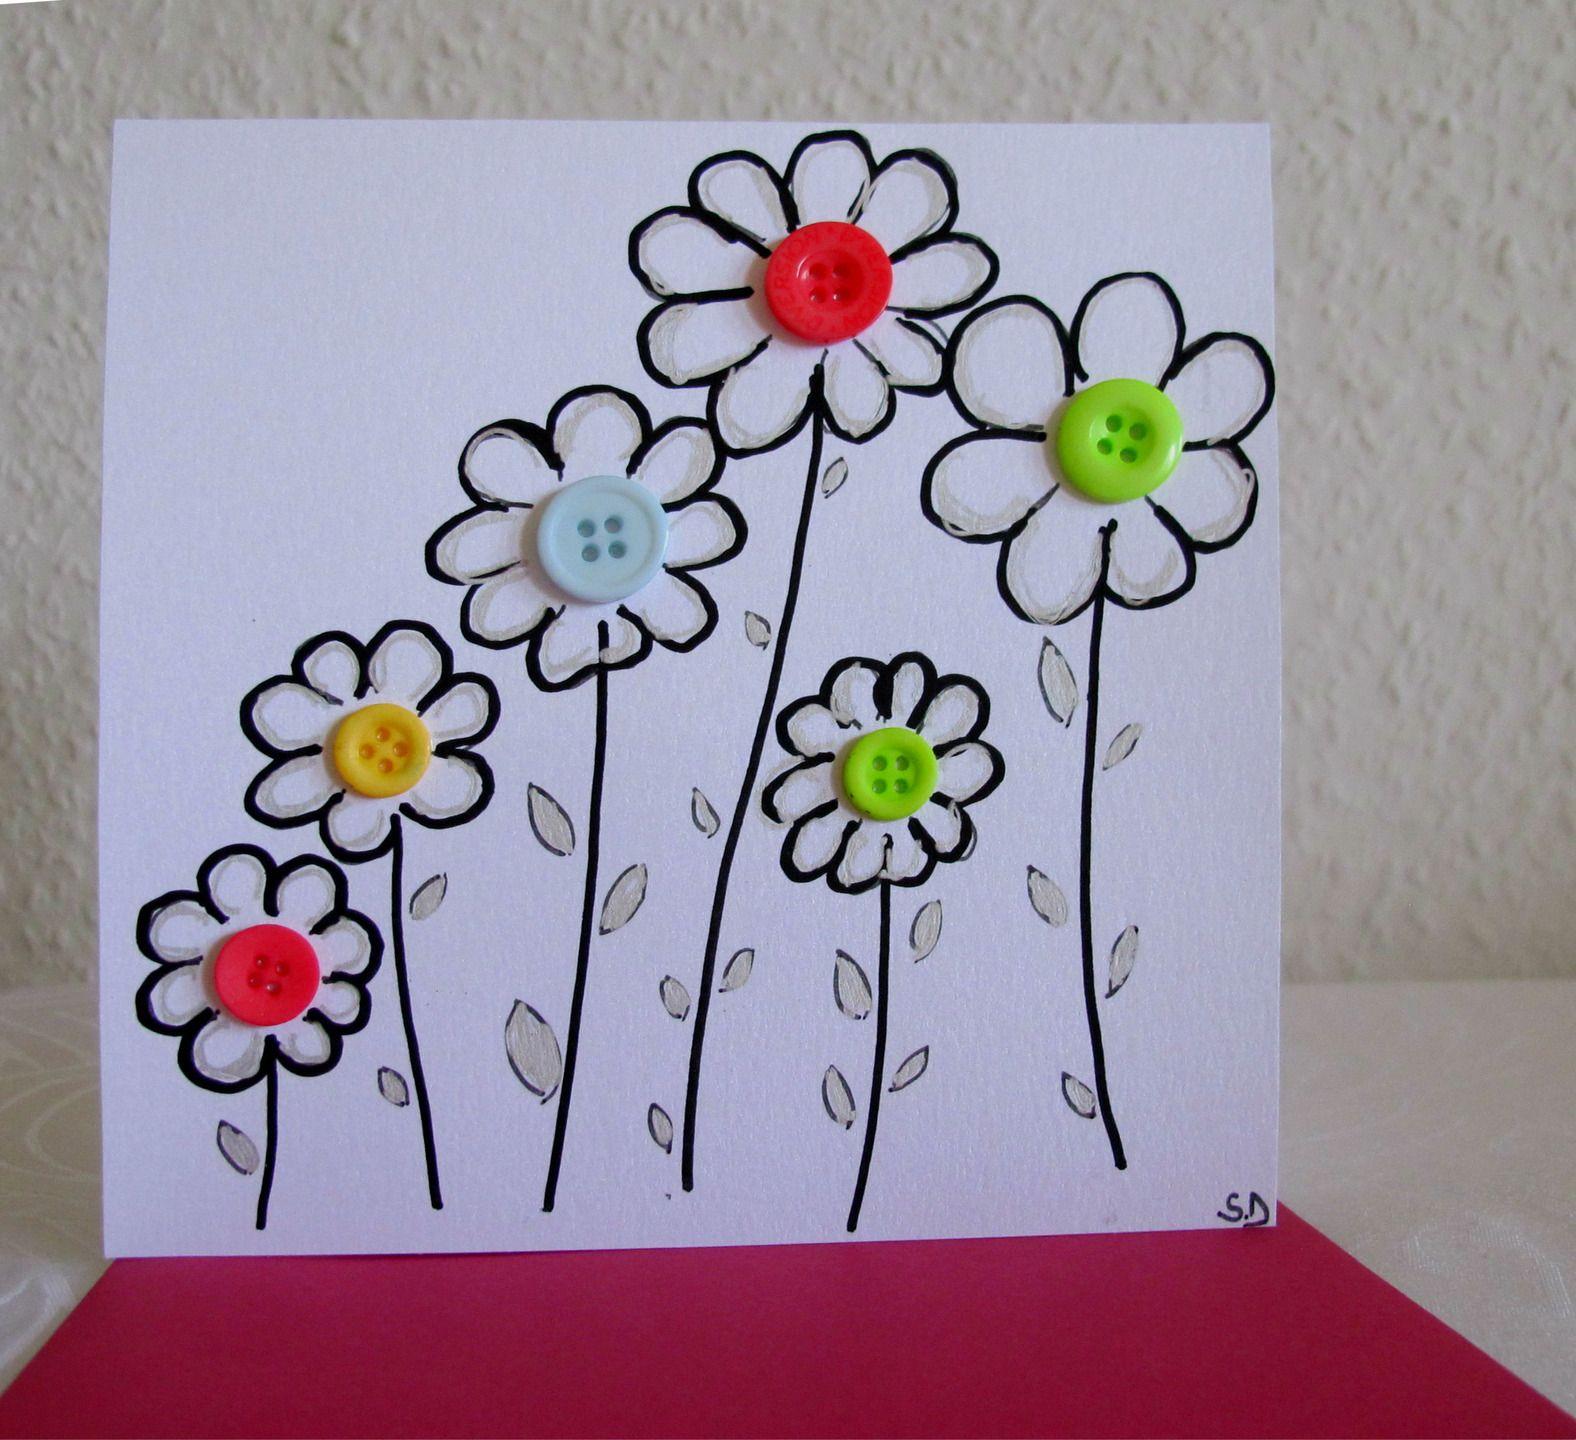 carte originale petites fleurs carte anniversaire carte boutons diy pinterest carte. Black Bedroom Furniture Sets. Home Design Ideas